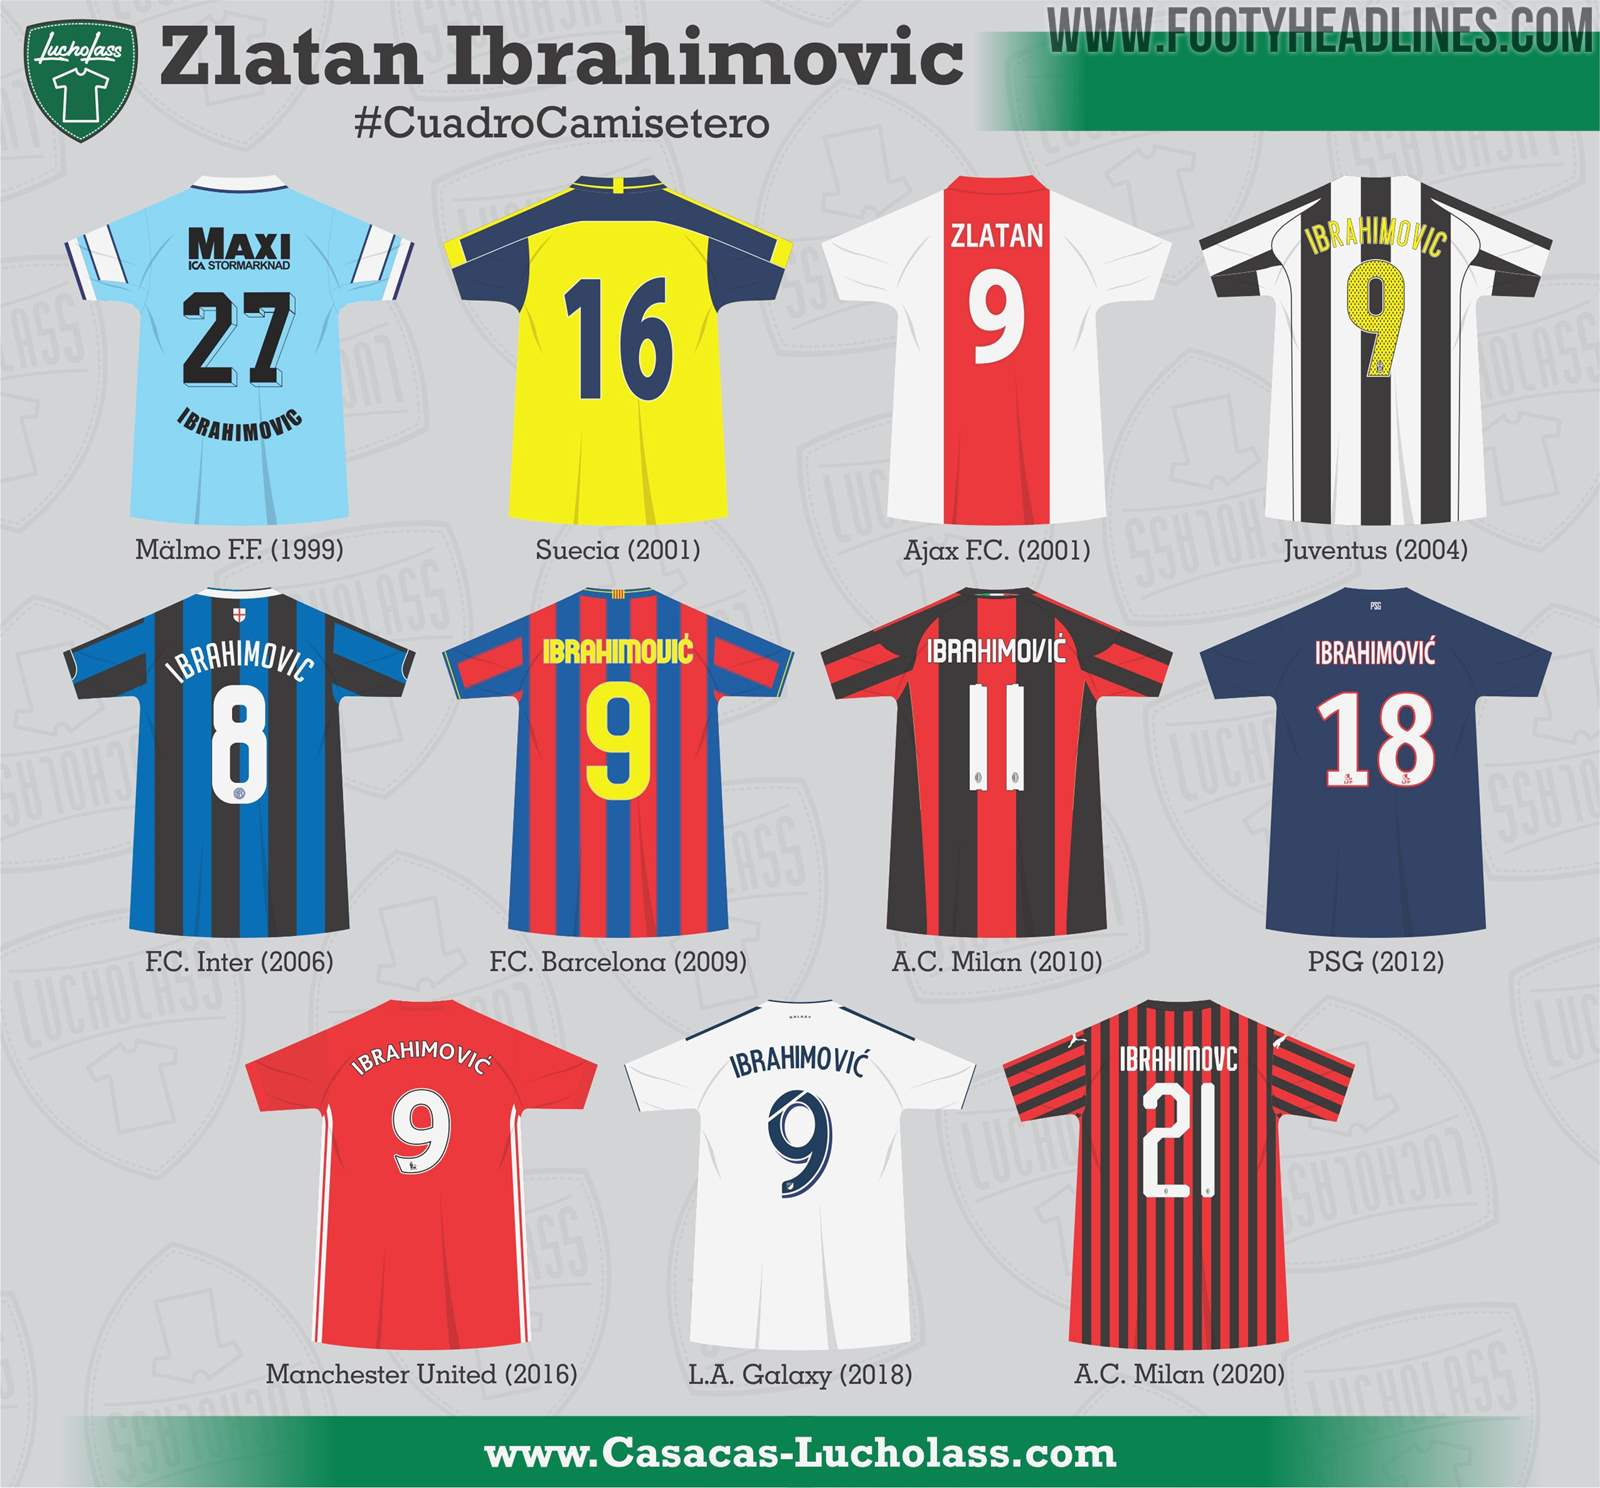 Debut Today All 23 Zlatan Ibrahimovic Home Kits Of His Career Footy Headlines